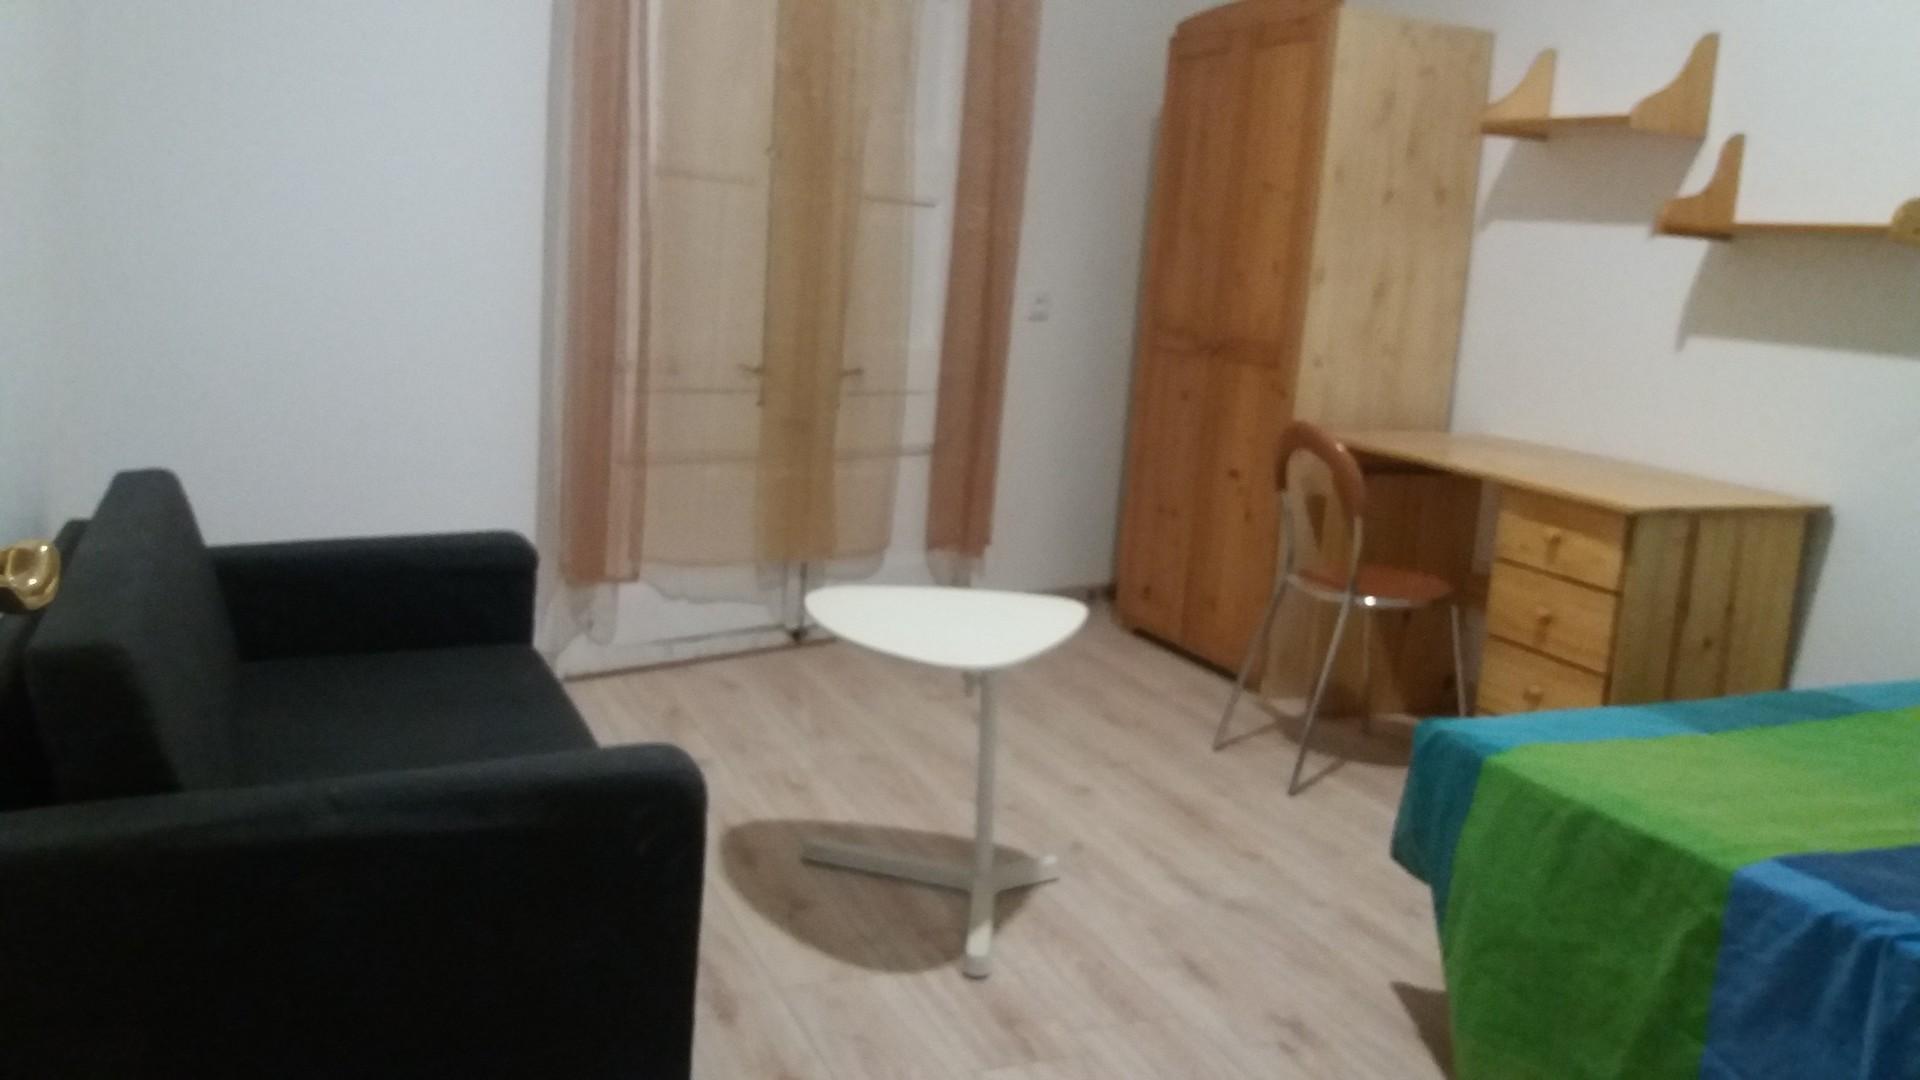 alquiler-3-habitaciones-piso-centrico-reformado-recientemente-82e9b2e32a6fa2f4d041887e72fe33a1